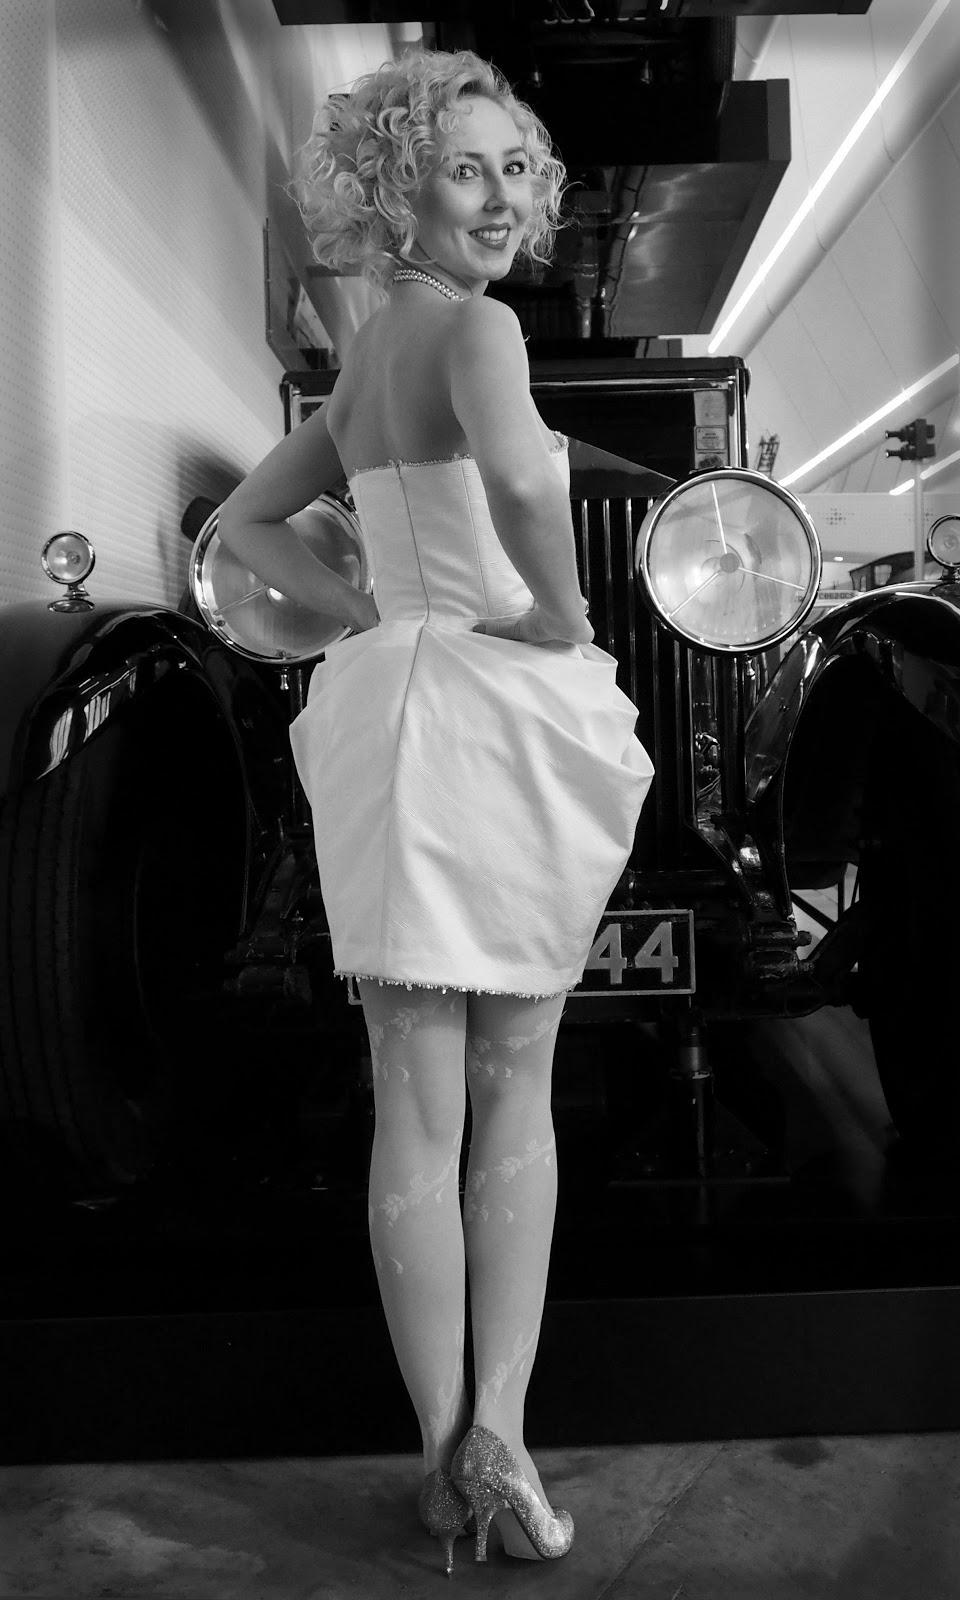 wedding dress, bridal, couture, Glasgow, Riverside Transport Museum, soutache, Swarovski, pearls, retro, beaded, fashion technology, Glasgow Clyde College, Czech beads, Preciosa, Deichmann, Remnant Kings, ethical, Tocha's World